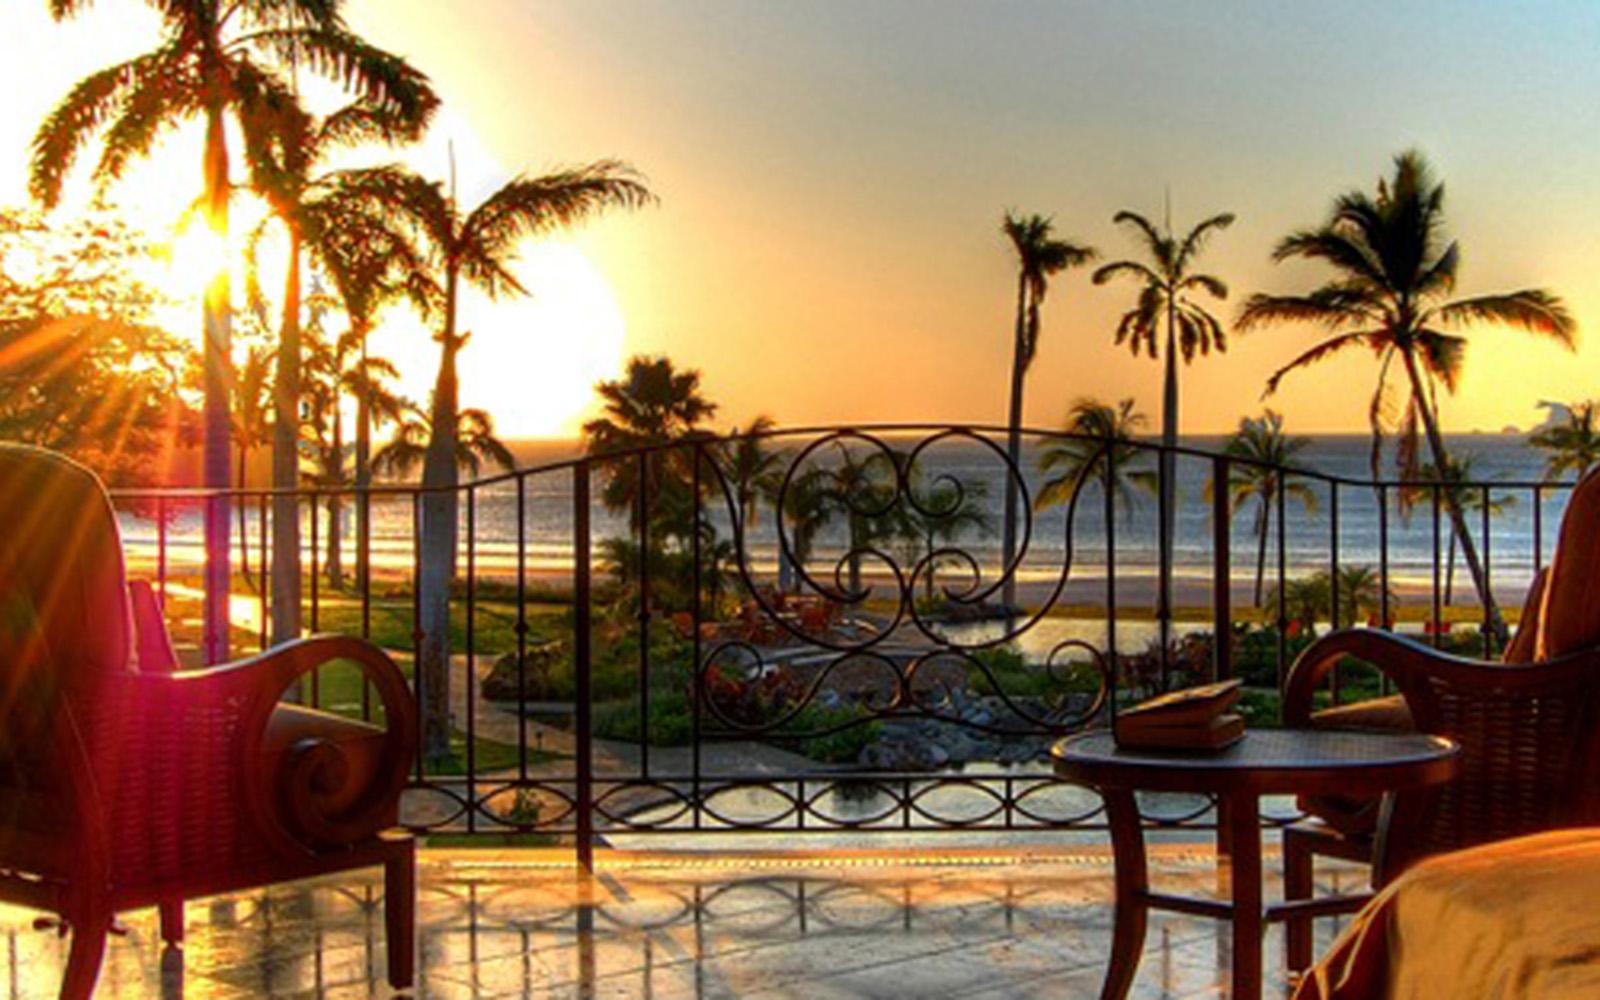 The Palms-Legendary Sunsets of Flamingo